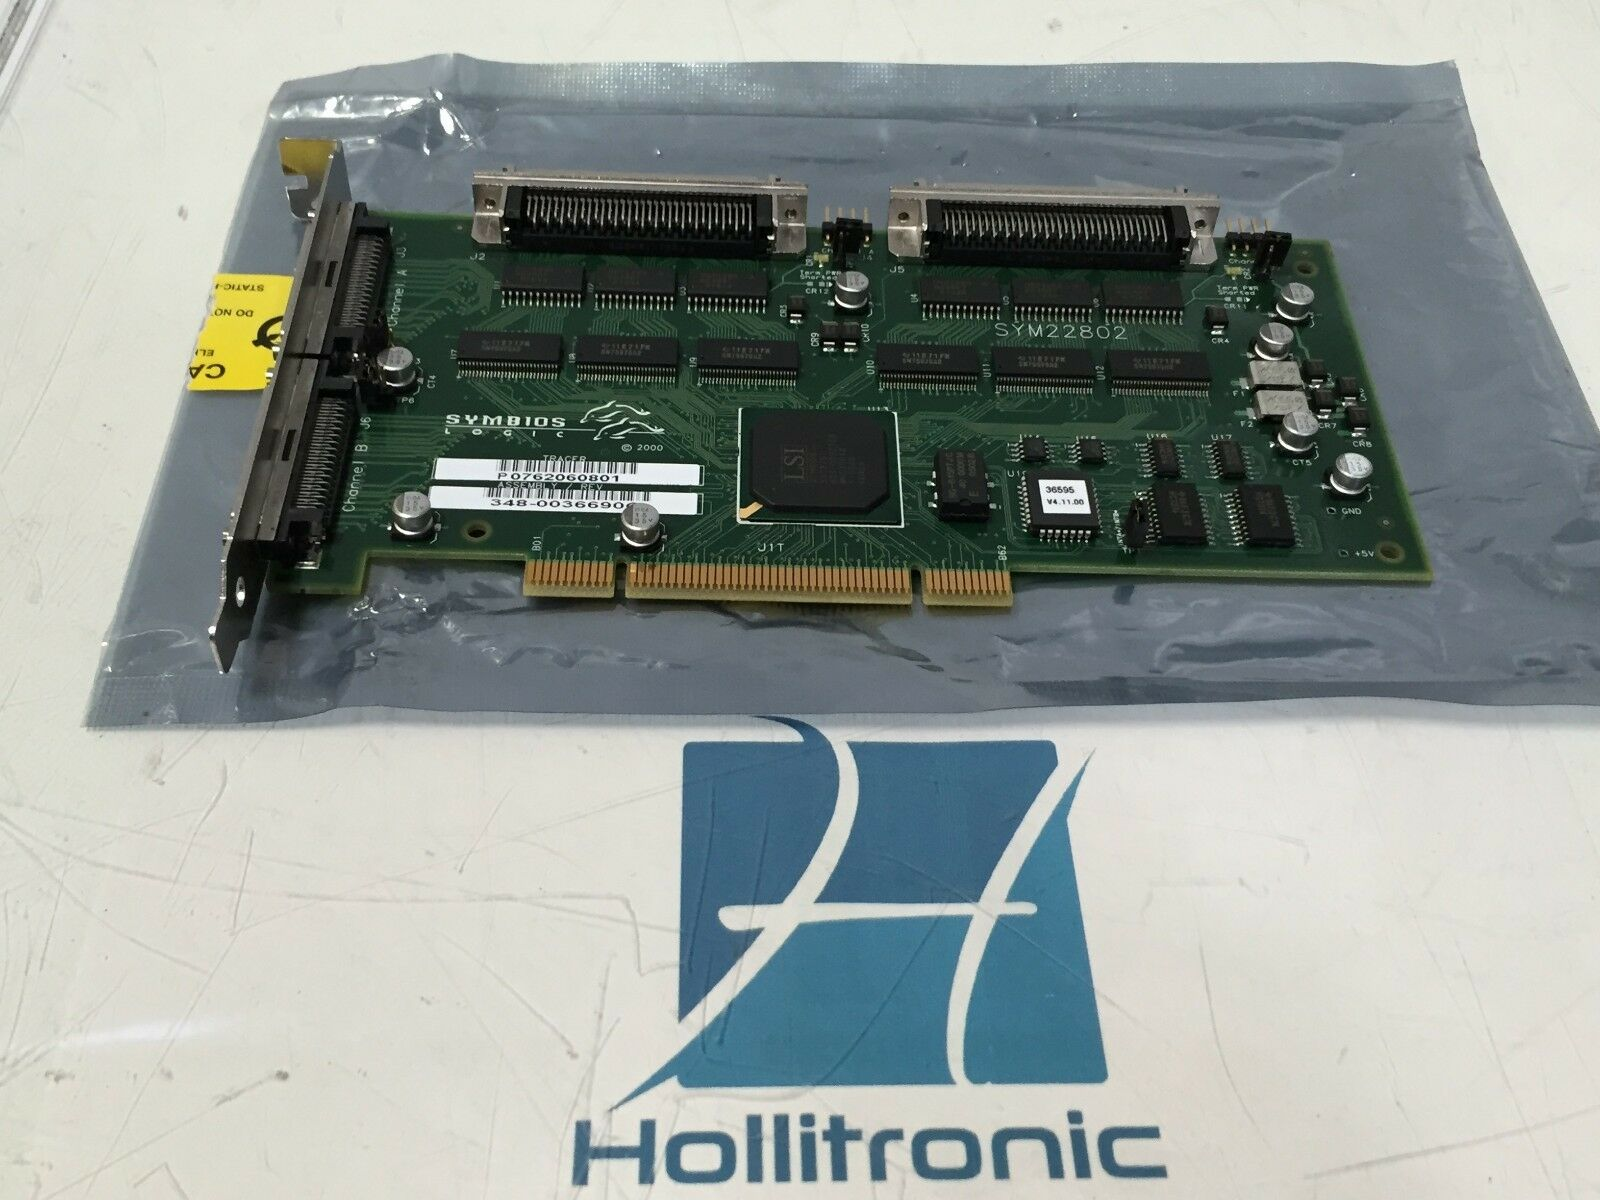 Sun Microsystems Symbios Logic SCSI Card SYM22802 348-0036690C